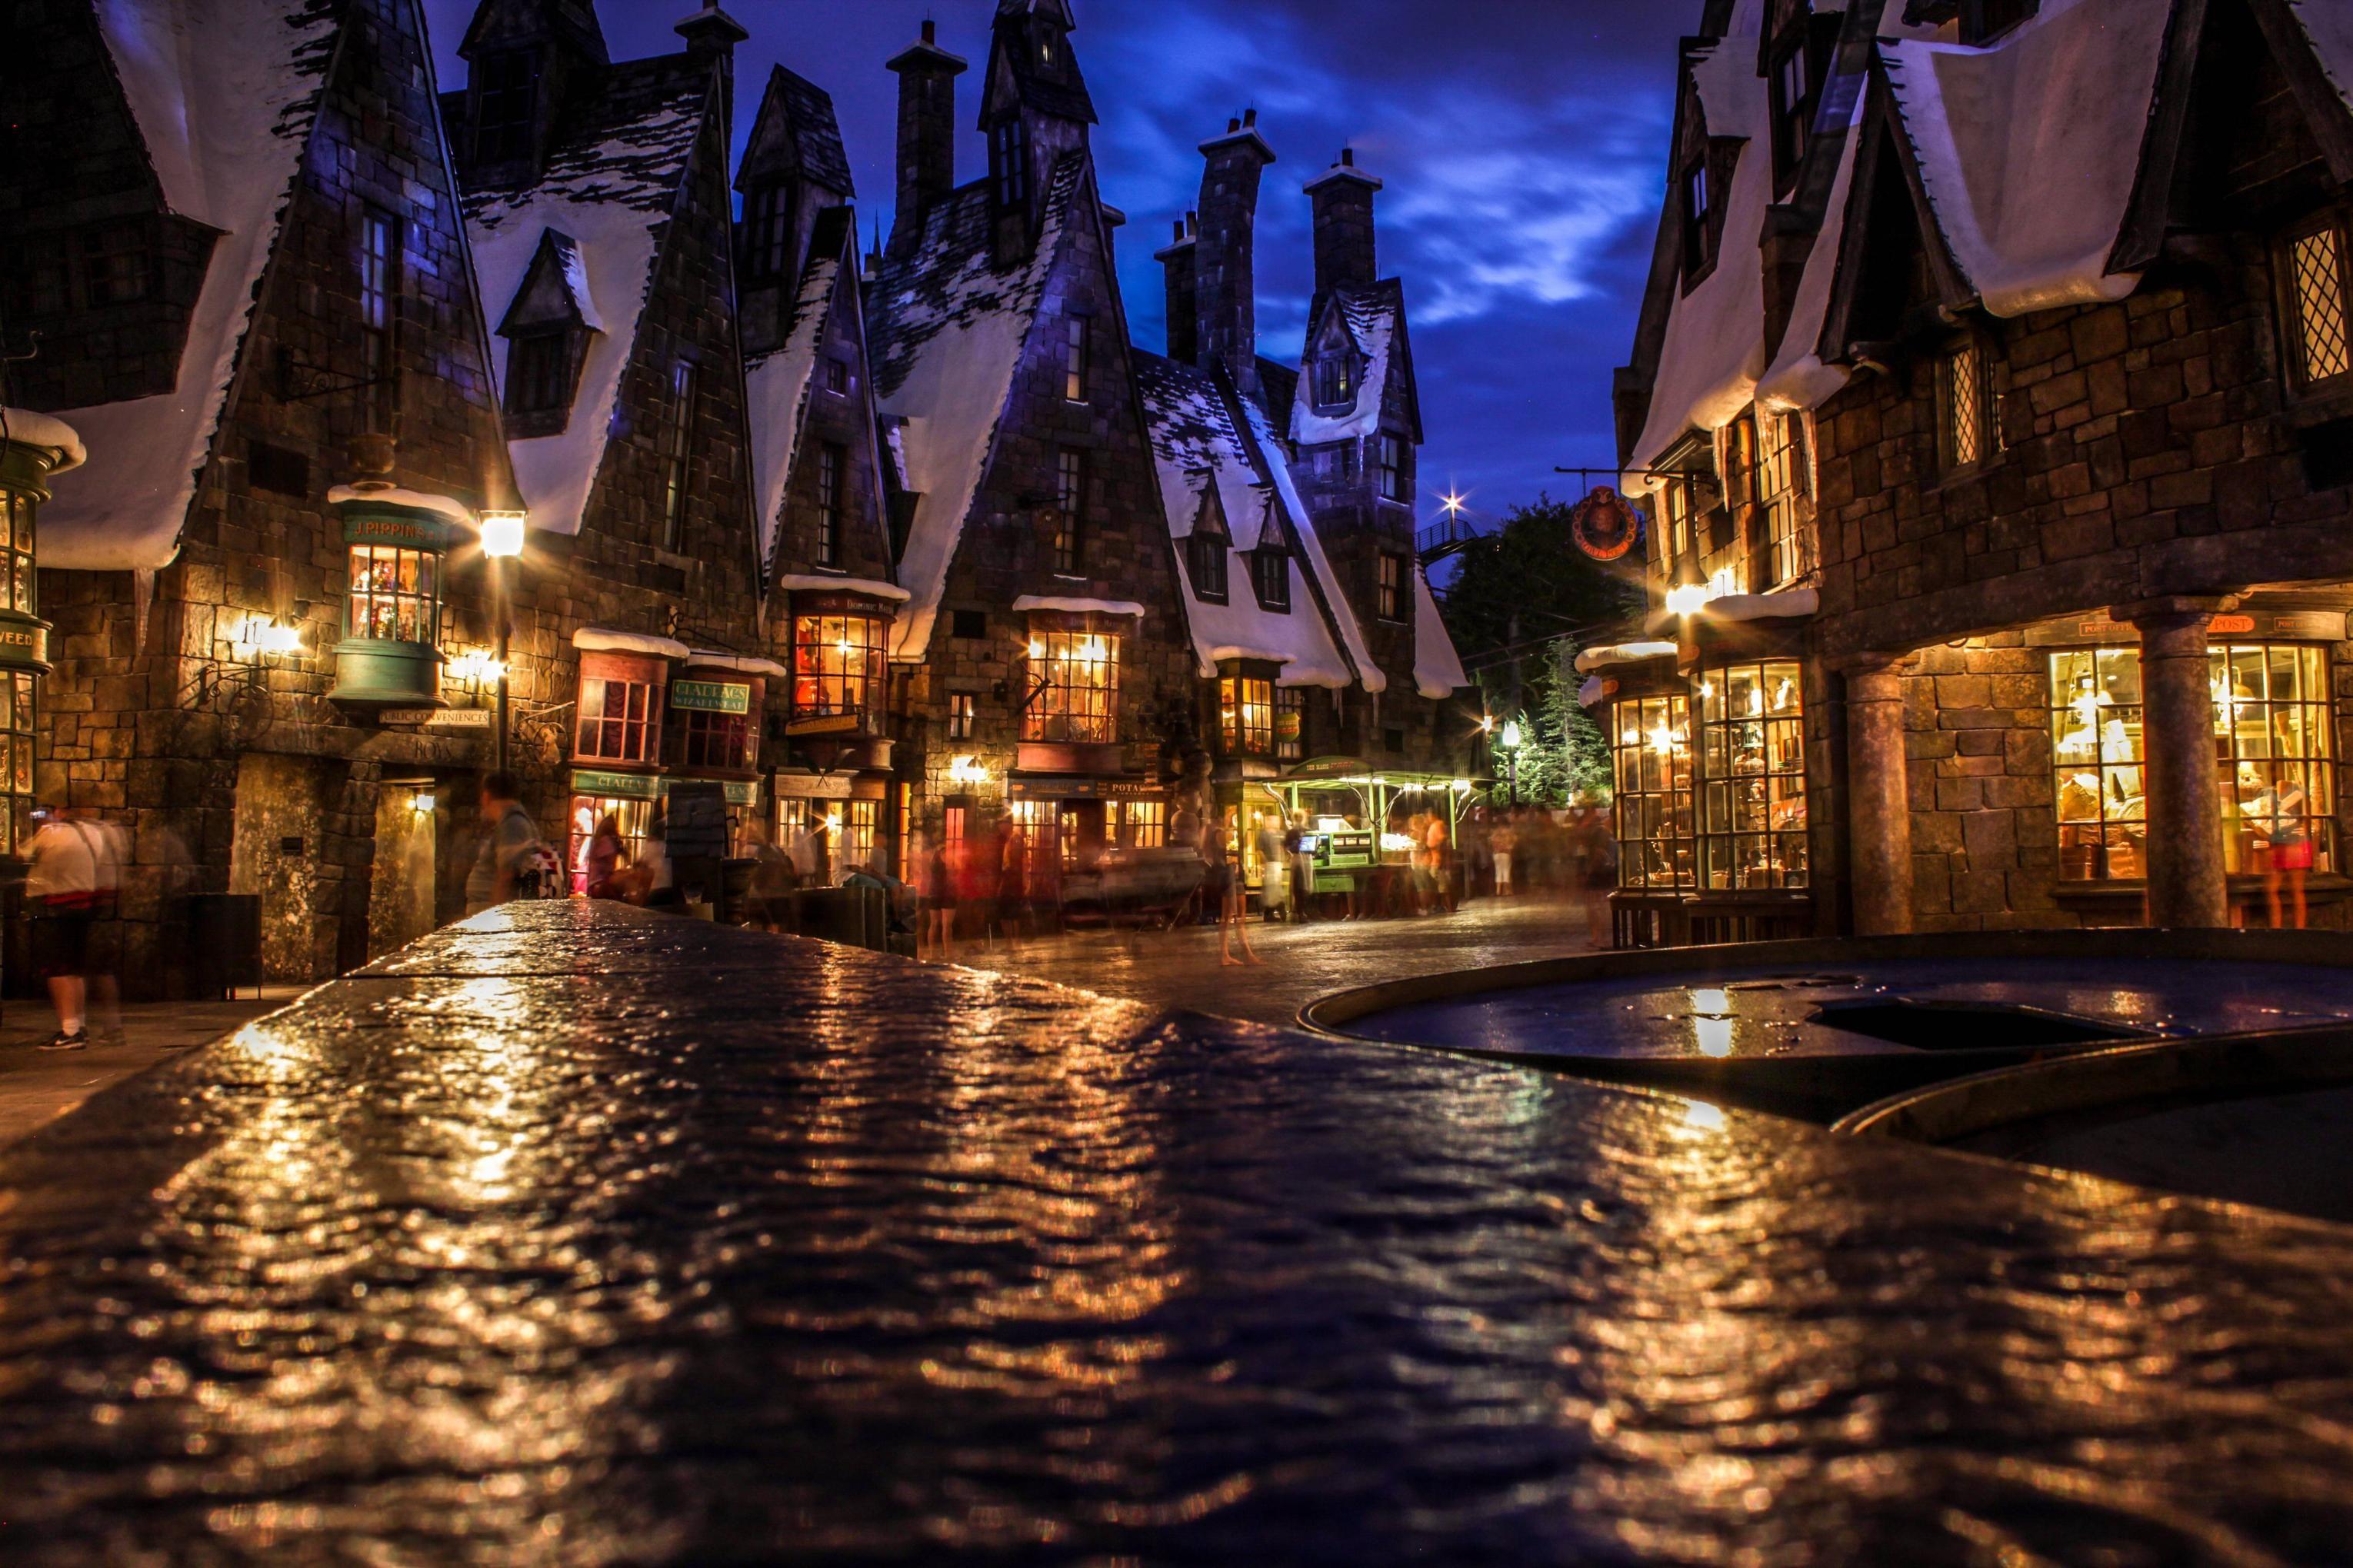 Cool Wallpaper Harry Potter Htc - 898b70023a5ad433fec6f1b677b45141  Best Photo Reference_72457.jpg